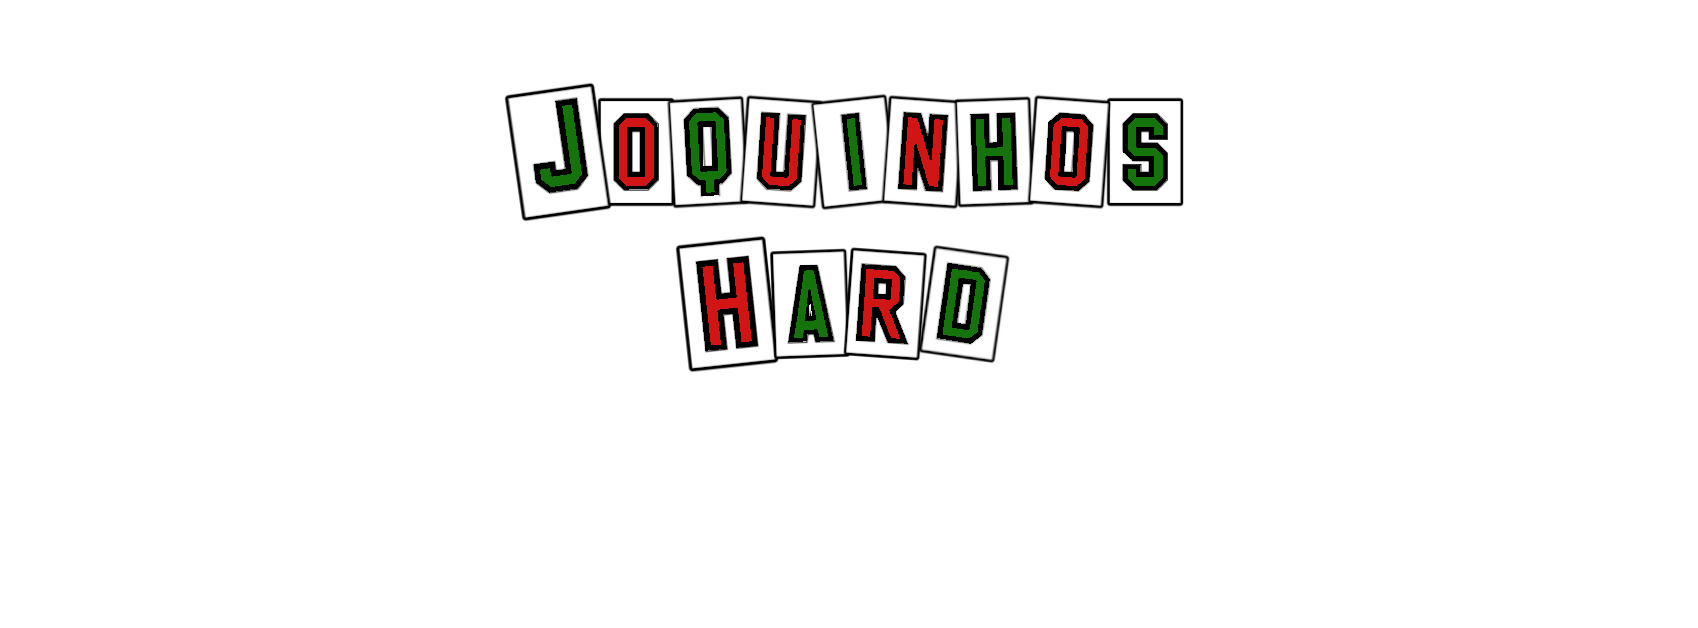 Jh logo grande